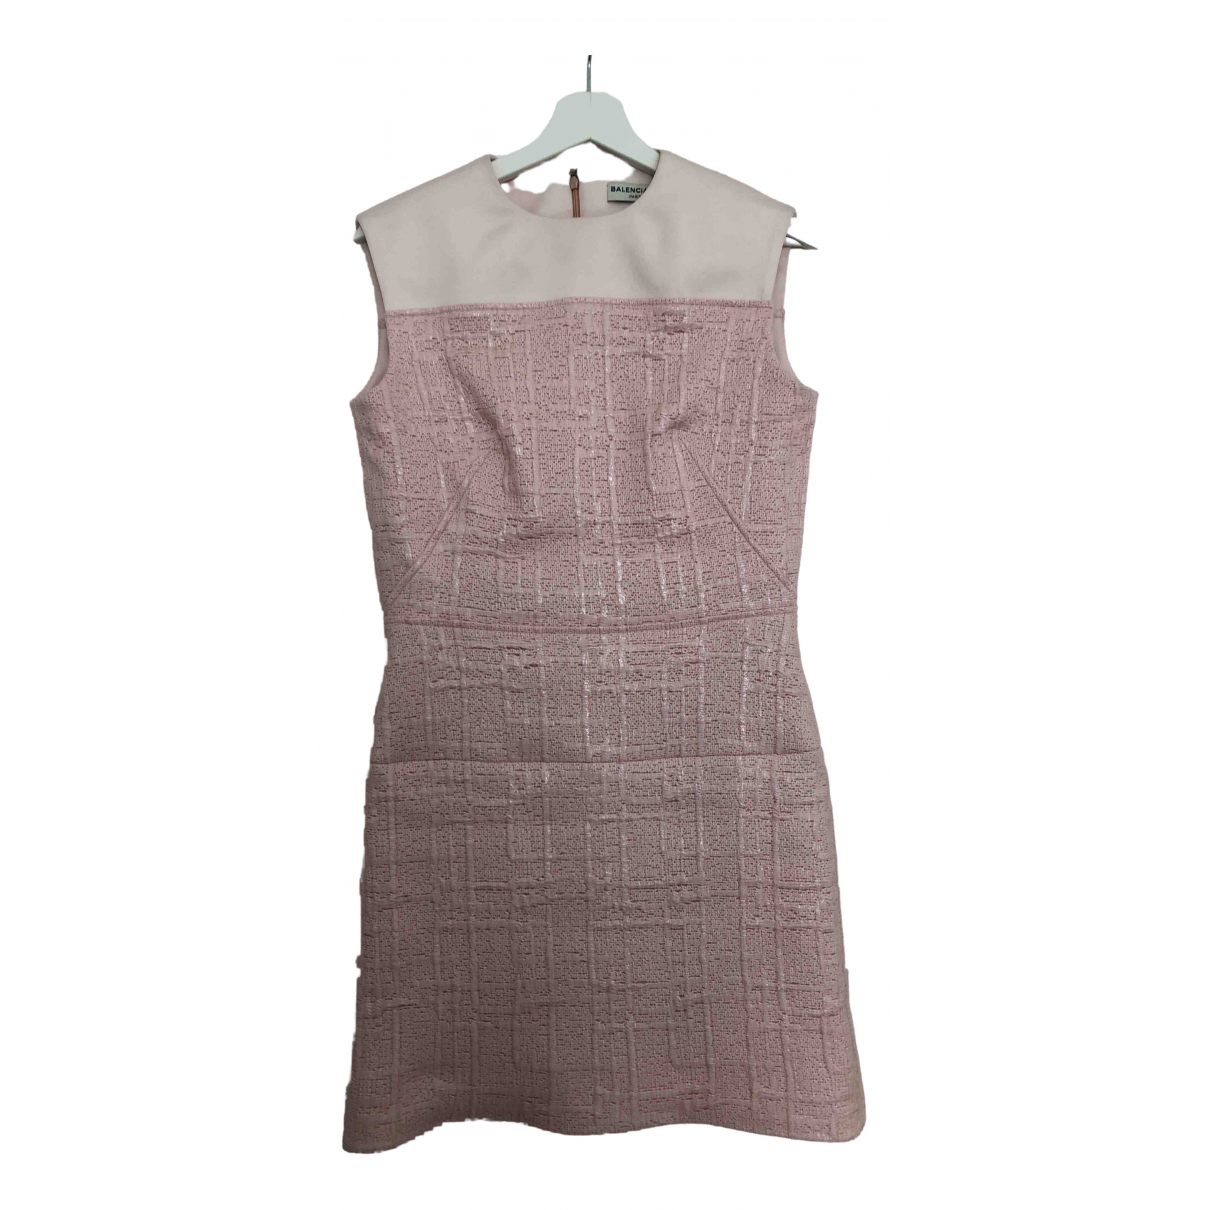 Balenciaga \N Pink dress for Women 40 FR